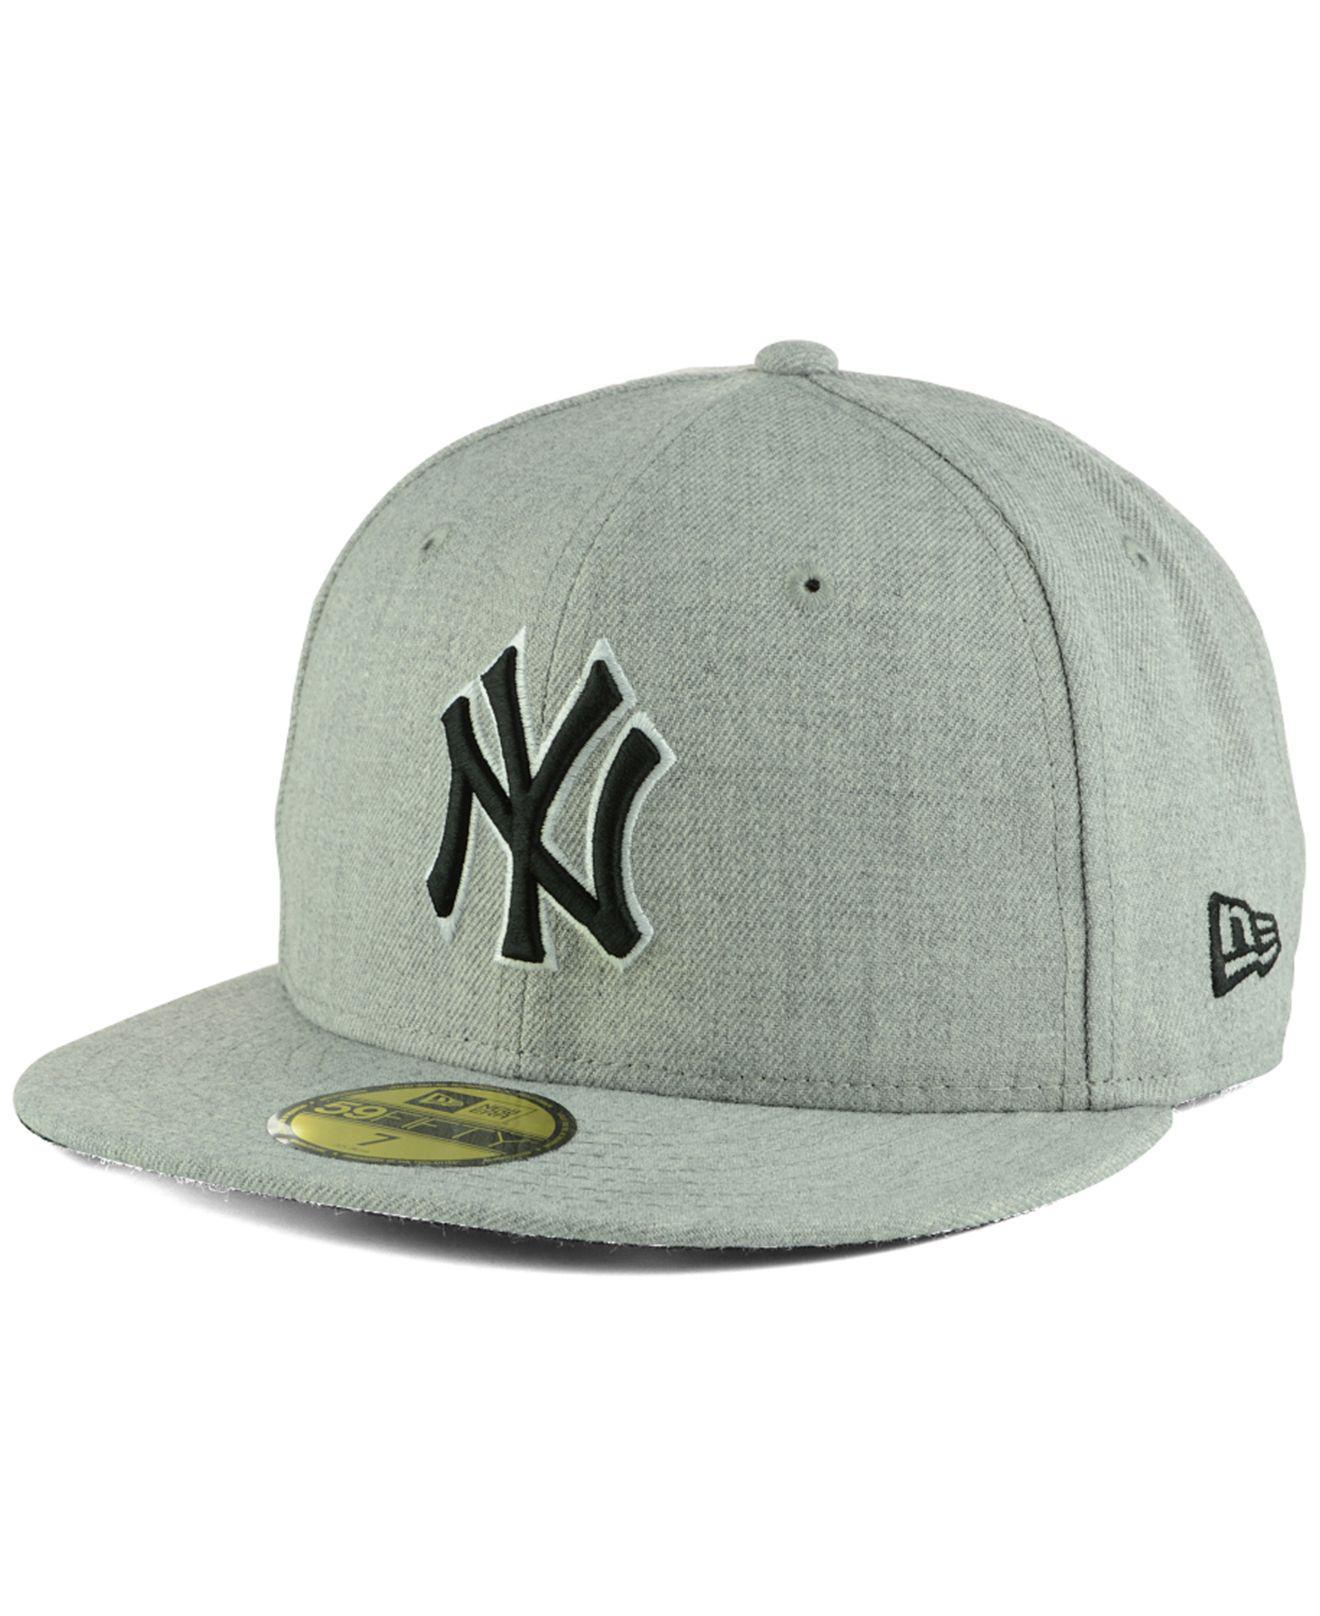 b1f42252819bcc Lyst - KTZ New York Yankees Heather Black White 59fifty Cap in Gray ...